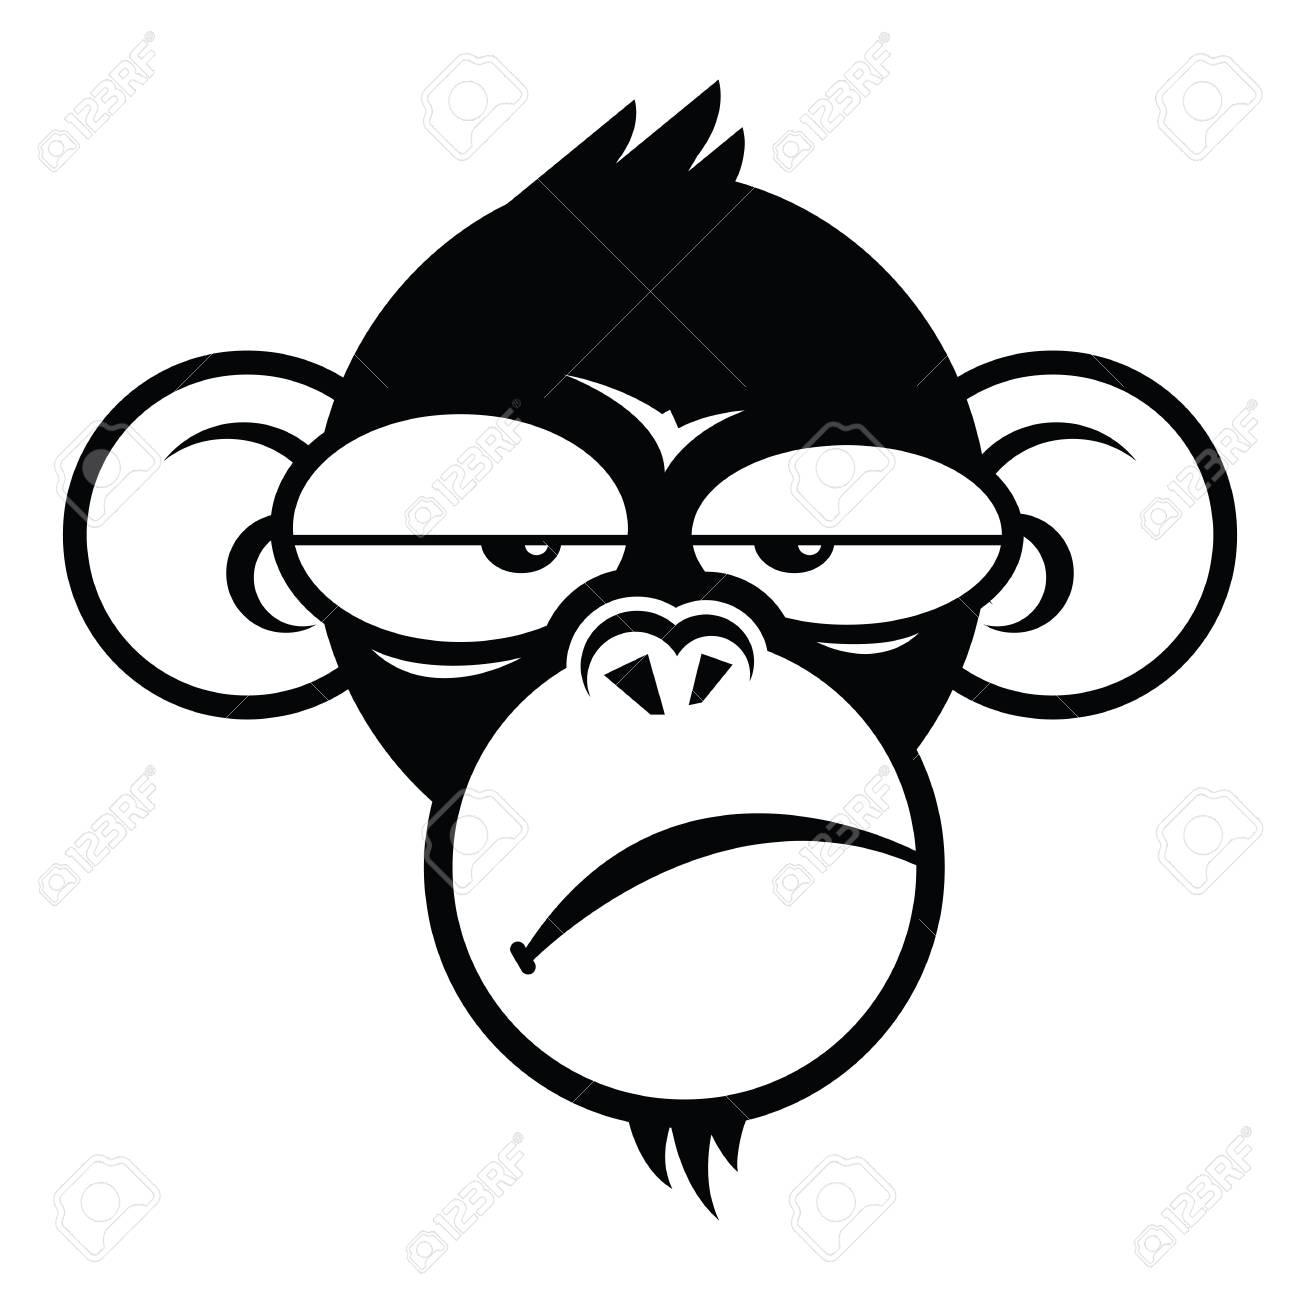 monkey sleepyface logo design template vector illustration